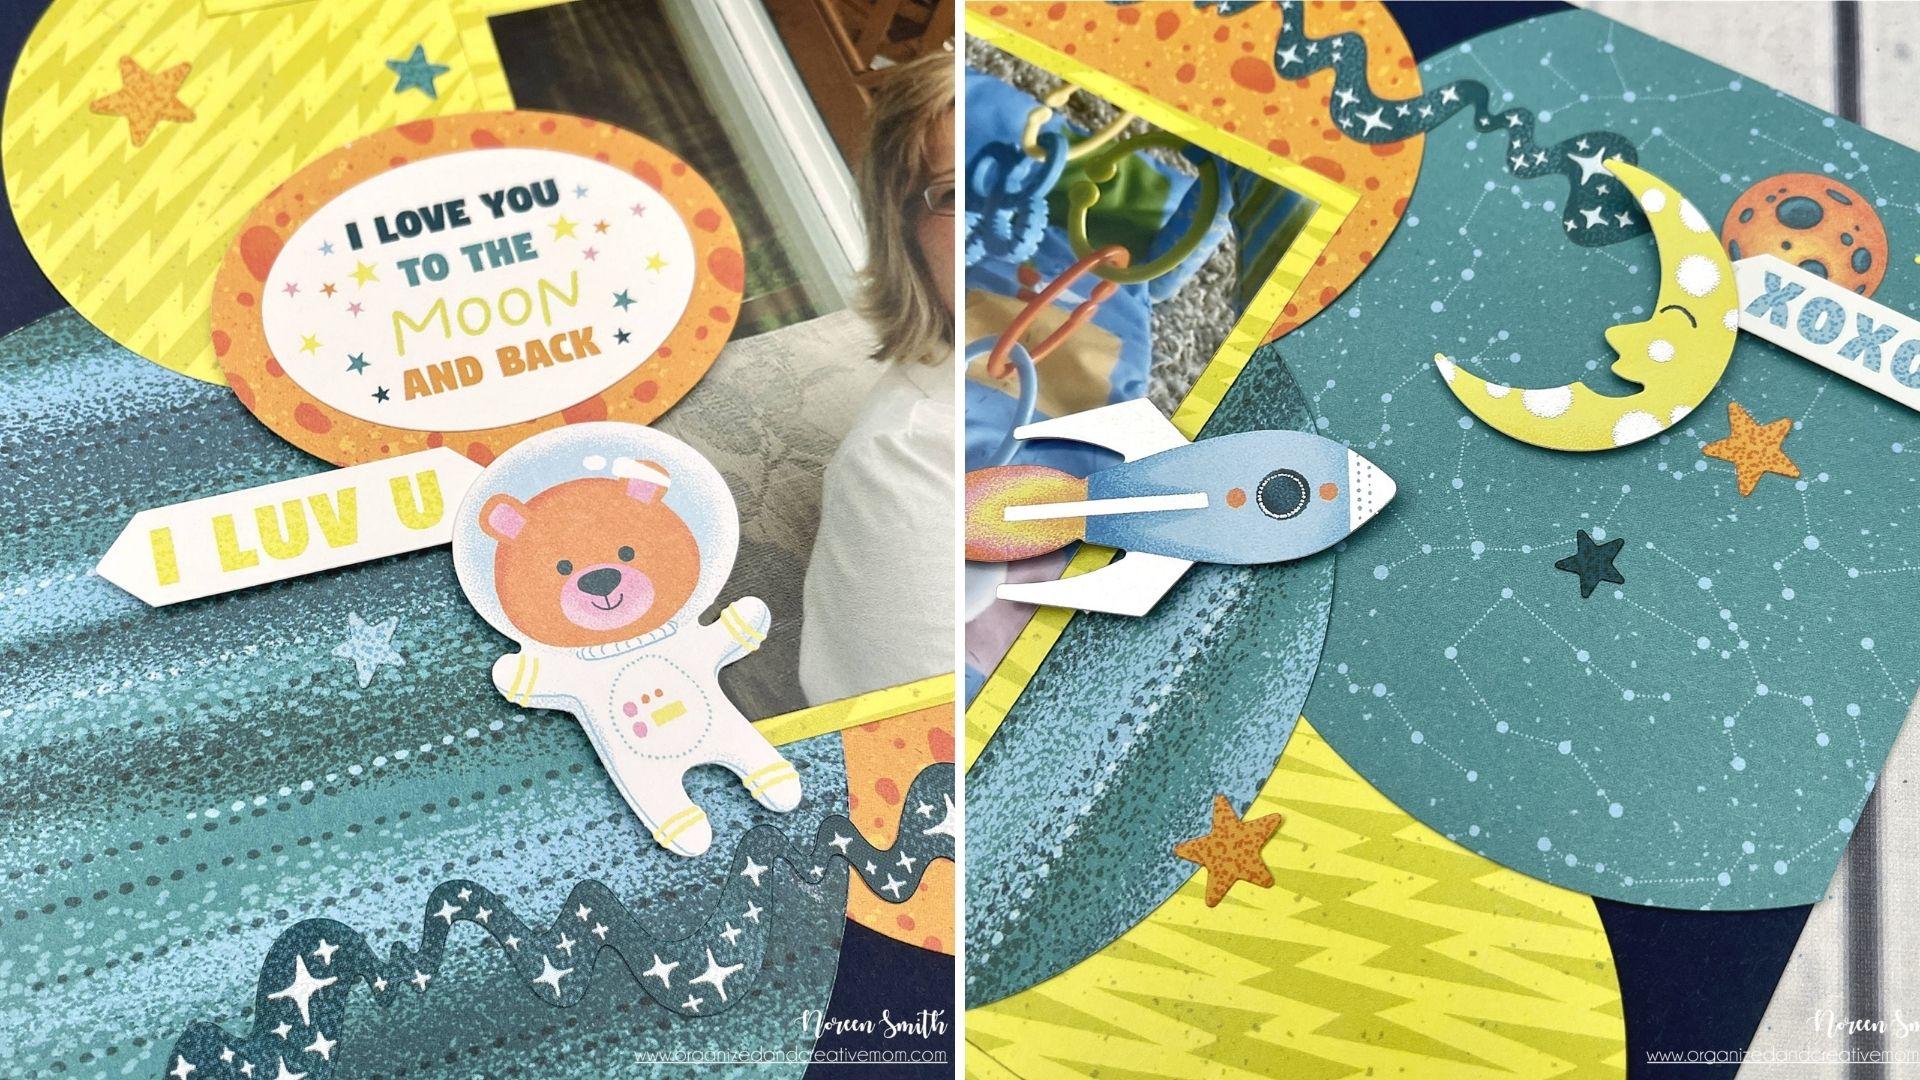 Details - Creative Memories - Outta This World - Scrapbook Layout